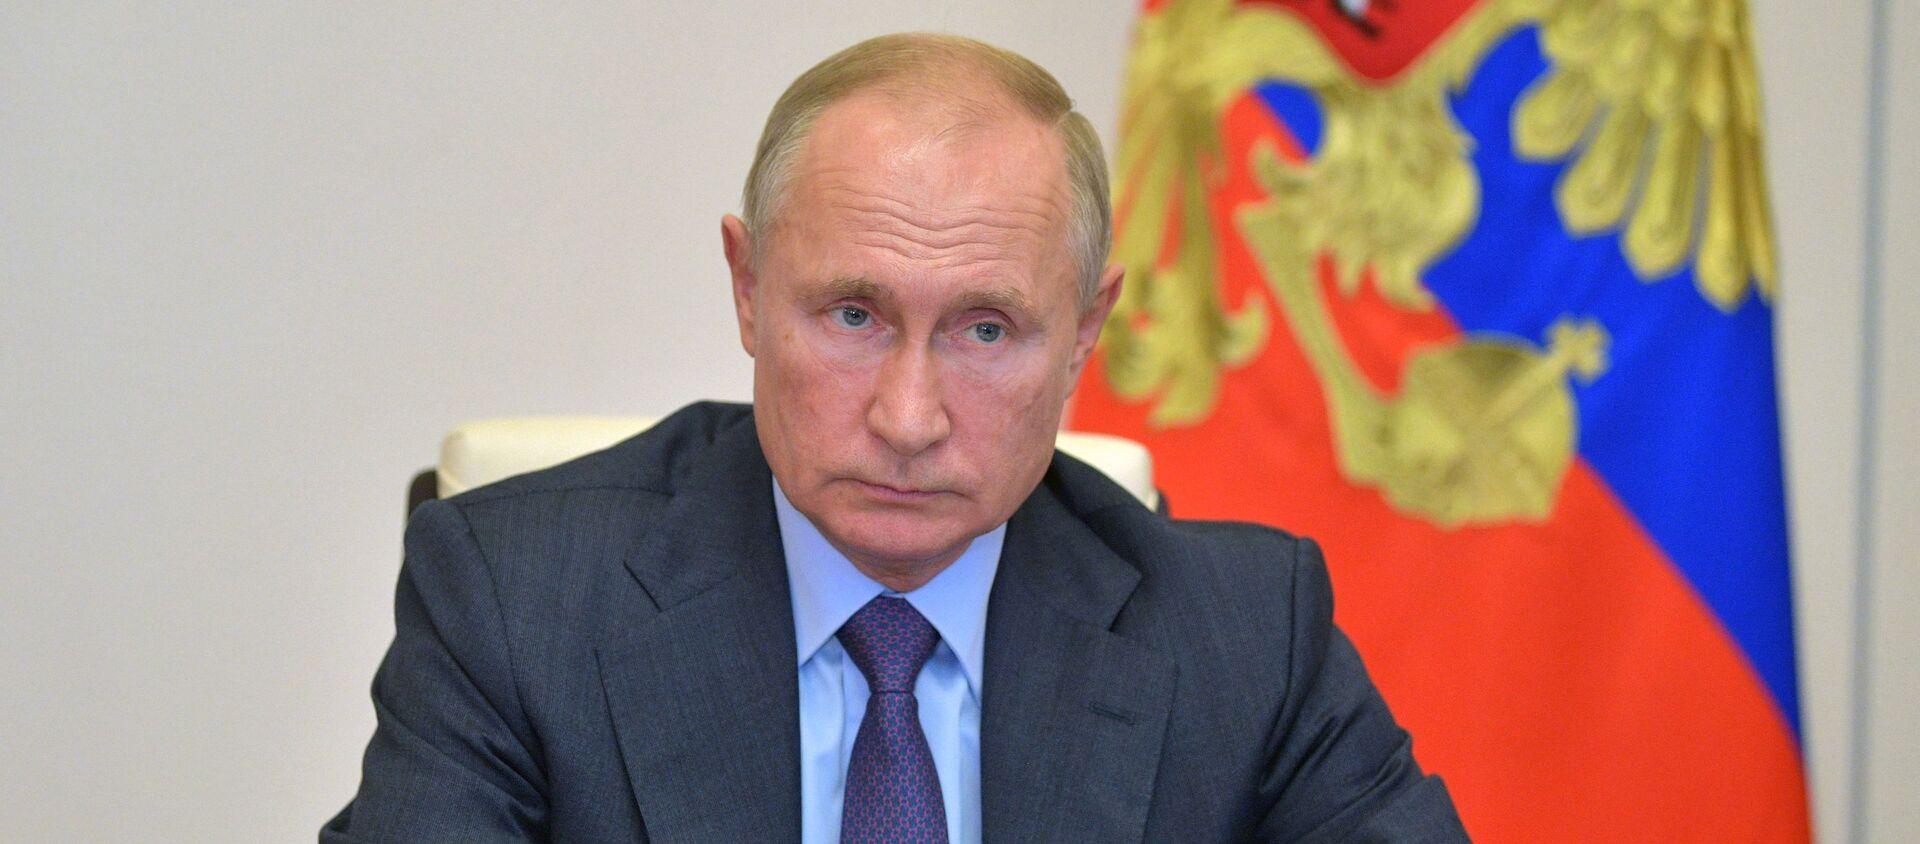 Prezydent Rosji Władimir Putin - Sputnik Polska, 1920, 18.03.2021